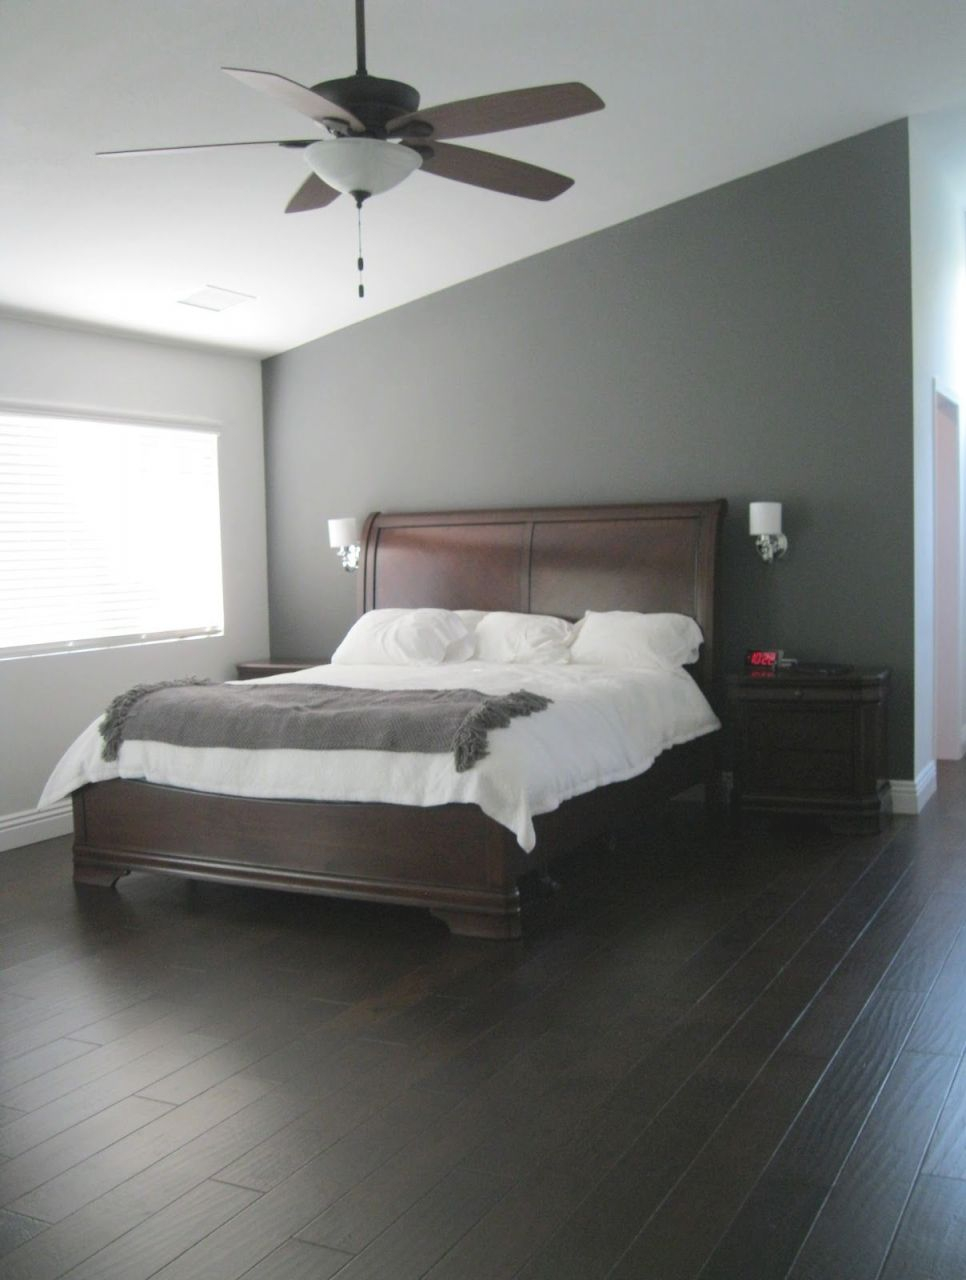 Bedroom Decoration. 27 Enthralling Grey Bedroom Ideas for Bedroom Decorating Ideas Grey And White